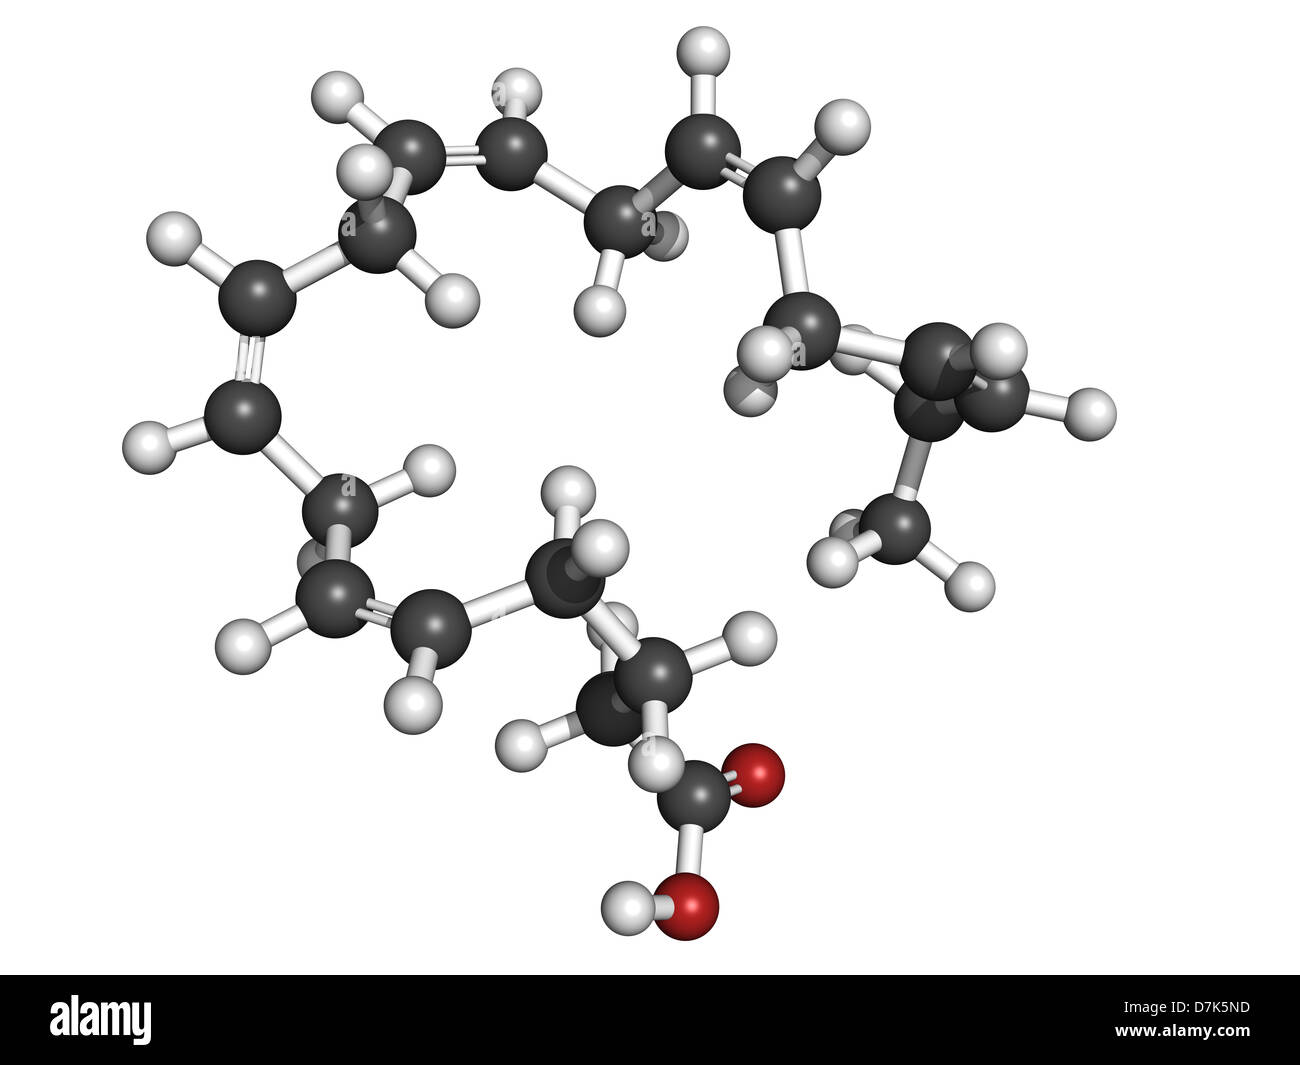 eicosapentaenoic acid epa omega 3 fatty acid molecular model epa stock photo 56355305 alamy. Black Bedroom Furniture Sets. Home Design Ideas